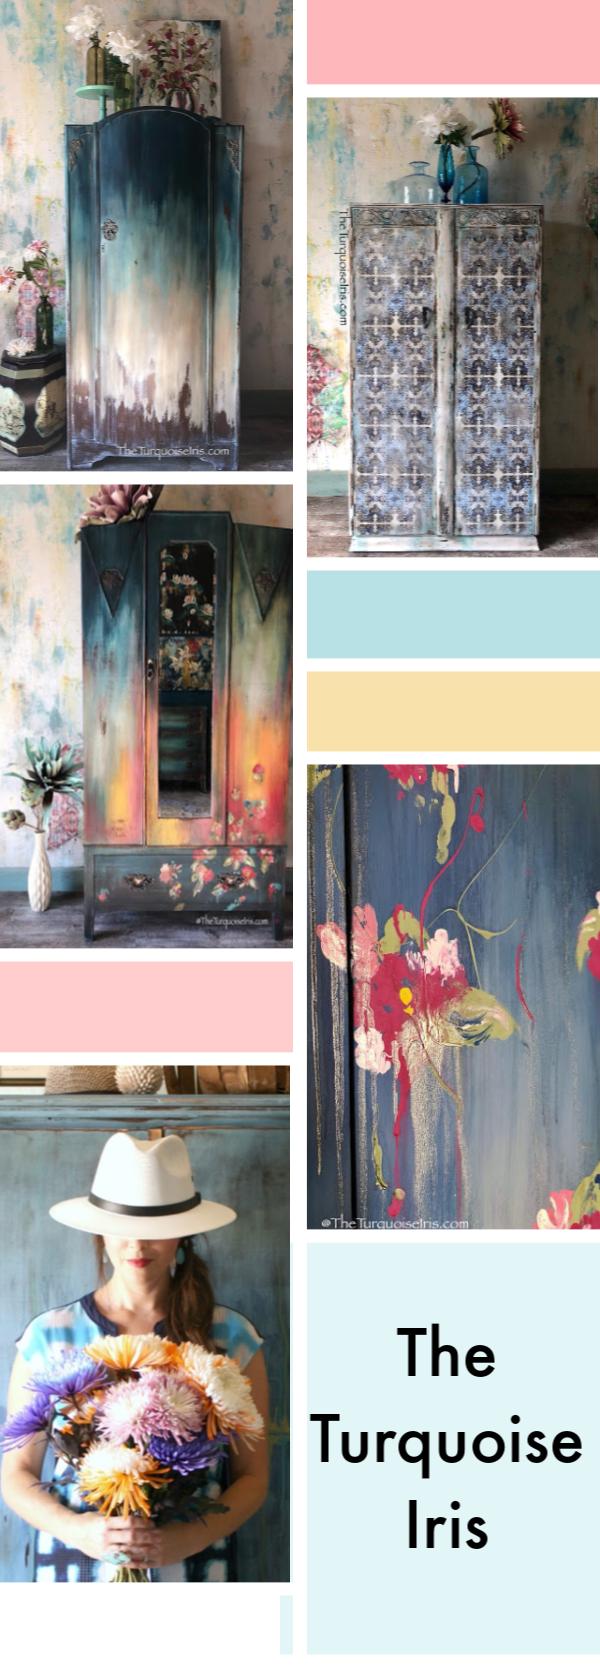 #DIY #Art #FurniturePainter #Furniture #create #TheTurquoiseIris #Paint #Vibrant #colorcombo #Turquoise #DionneWoods #artoninstagram #artistsofinstagram #modernart #SoDomino #originalart #fineart #oklahomaartist #furnitureartist #vintagefurniture #paintedfurniture #loveart #oklahomaartist #okcartist #oneofakind #theturquoiseiris #handpainted #claybasedpaint #createallday #creativeentreprenuer #dotheDionne #colormovement #tutorials #staging #howtostage #localart #iris #lovetocreate #lovetopaint